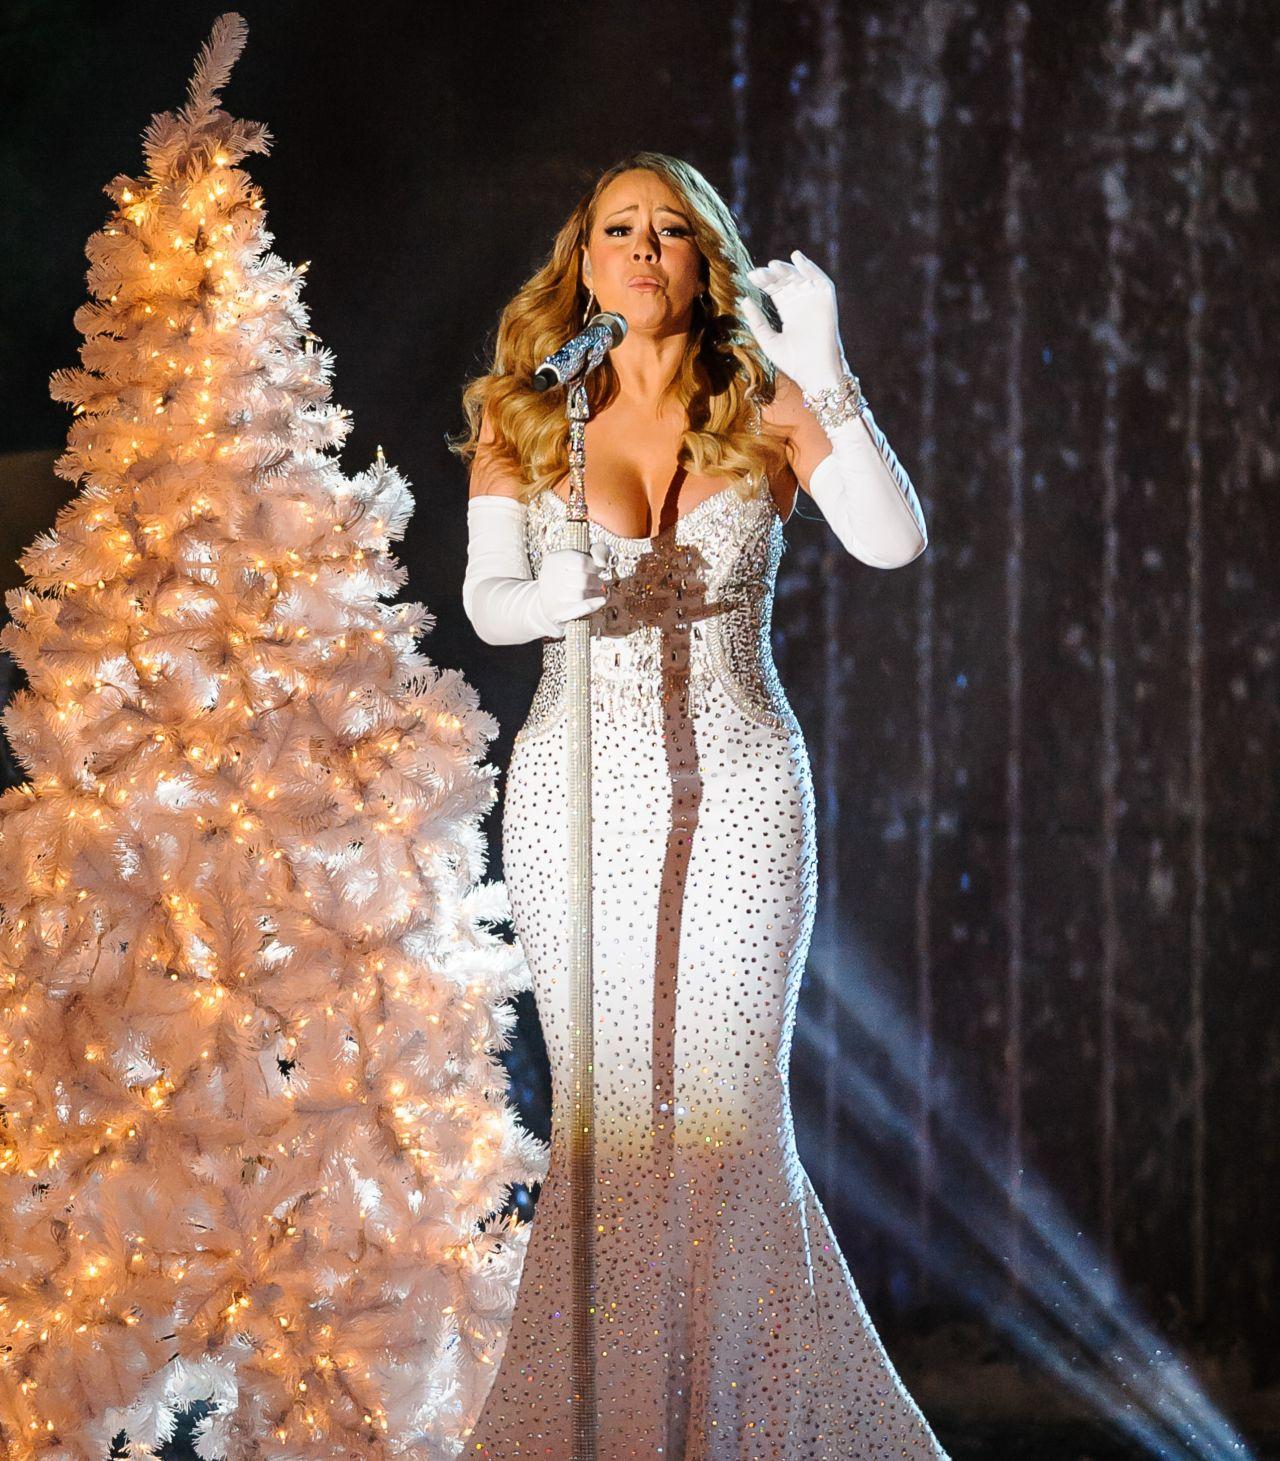 Rockefeller Christmas Tree Lighting 2014: Mariah Carey Performs At 81st Annual Rockefeller Center